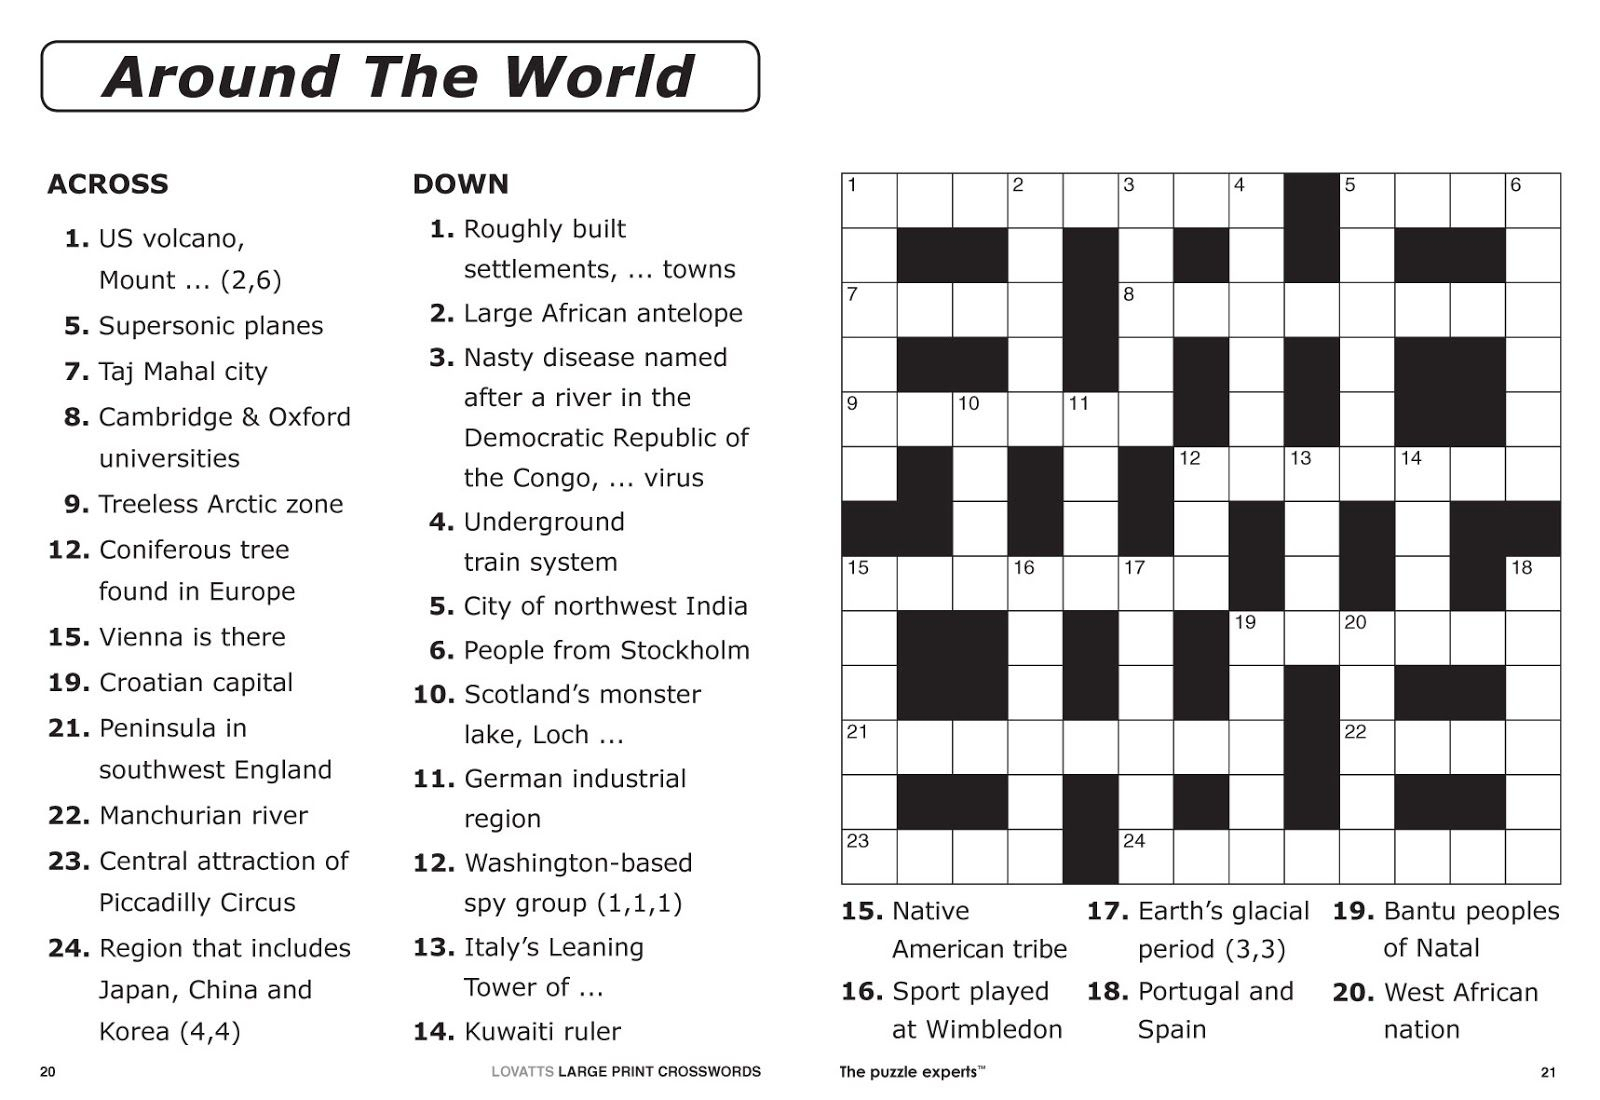 Free Printable Large Print Crossword Puzzles | M3U8 - Free Printable Easy Crossword Puzzles For Beginners